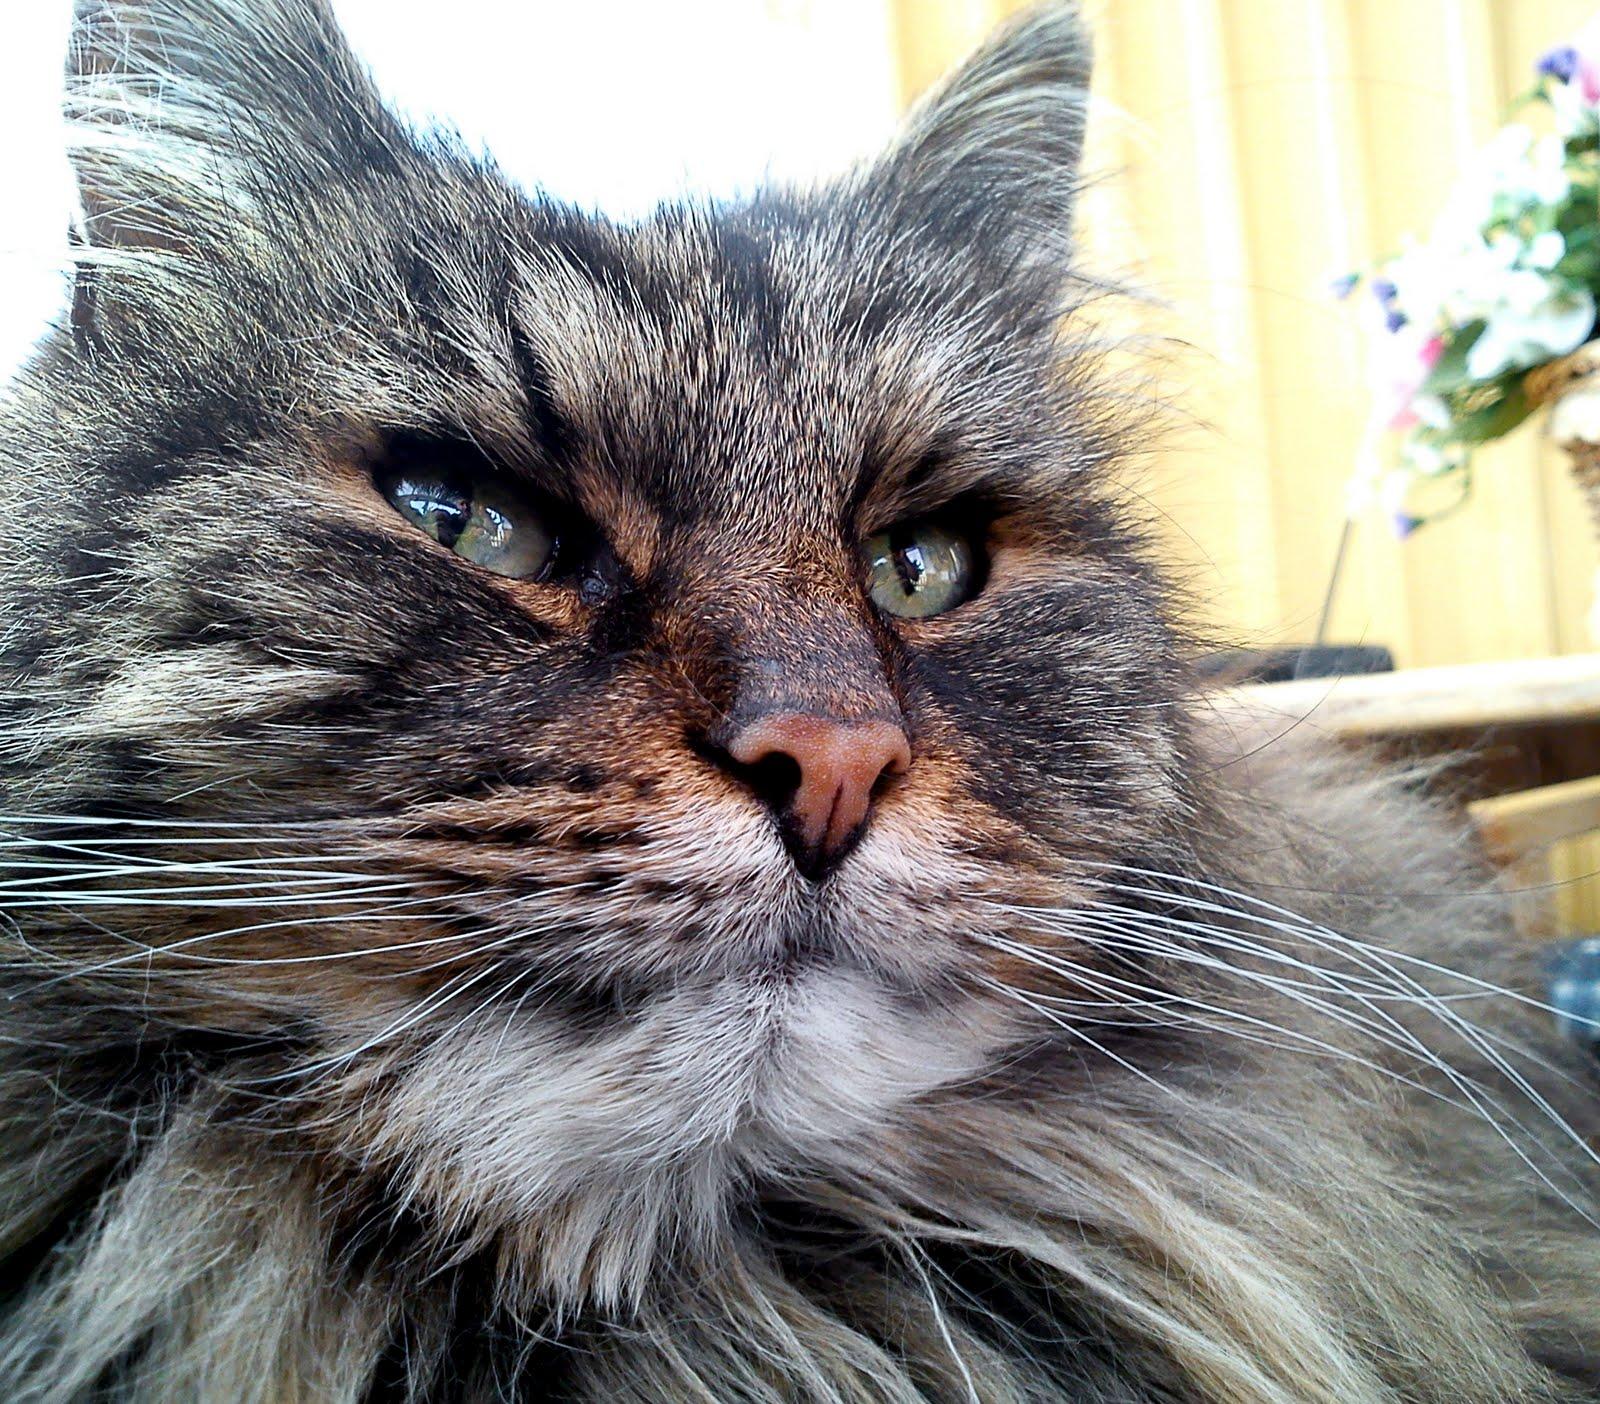 Noskvalster katt symptom